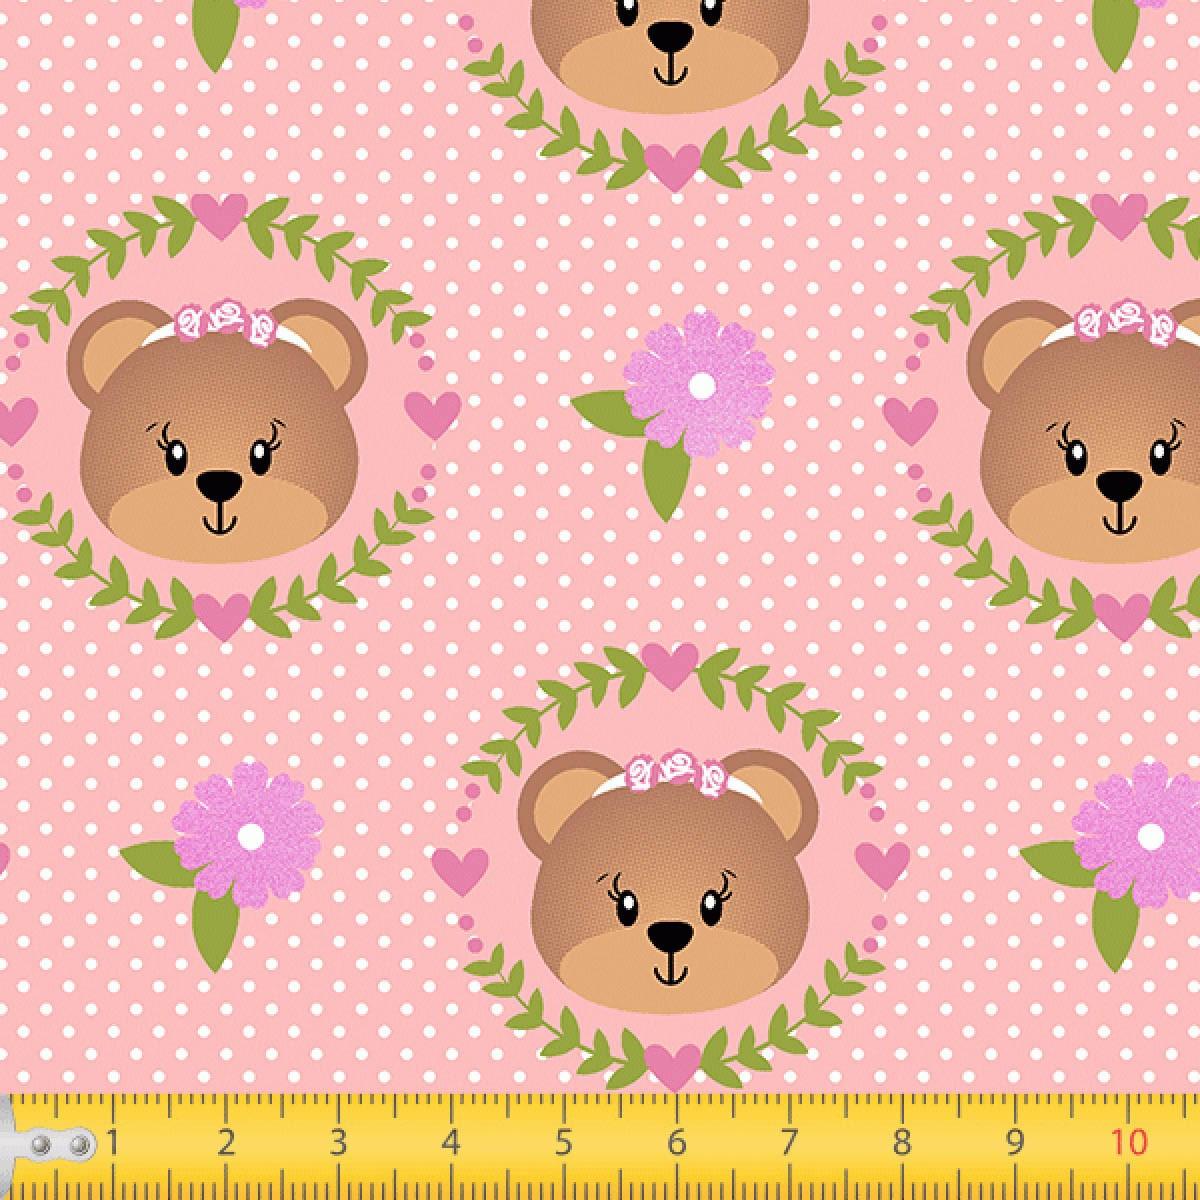 Tecido Tricoline estampado Urso floral rosa